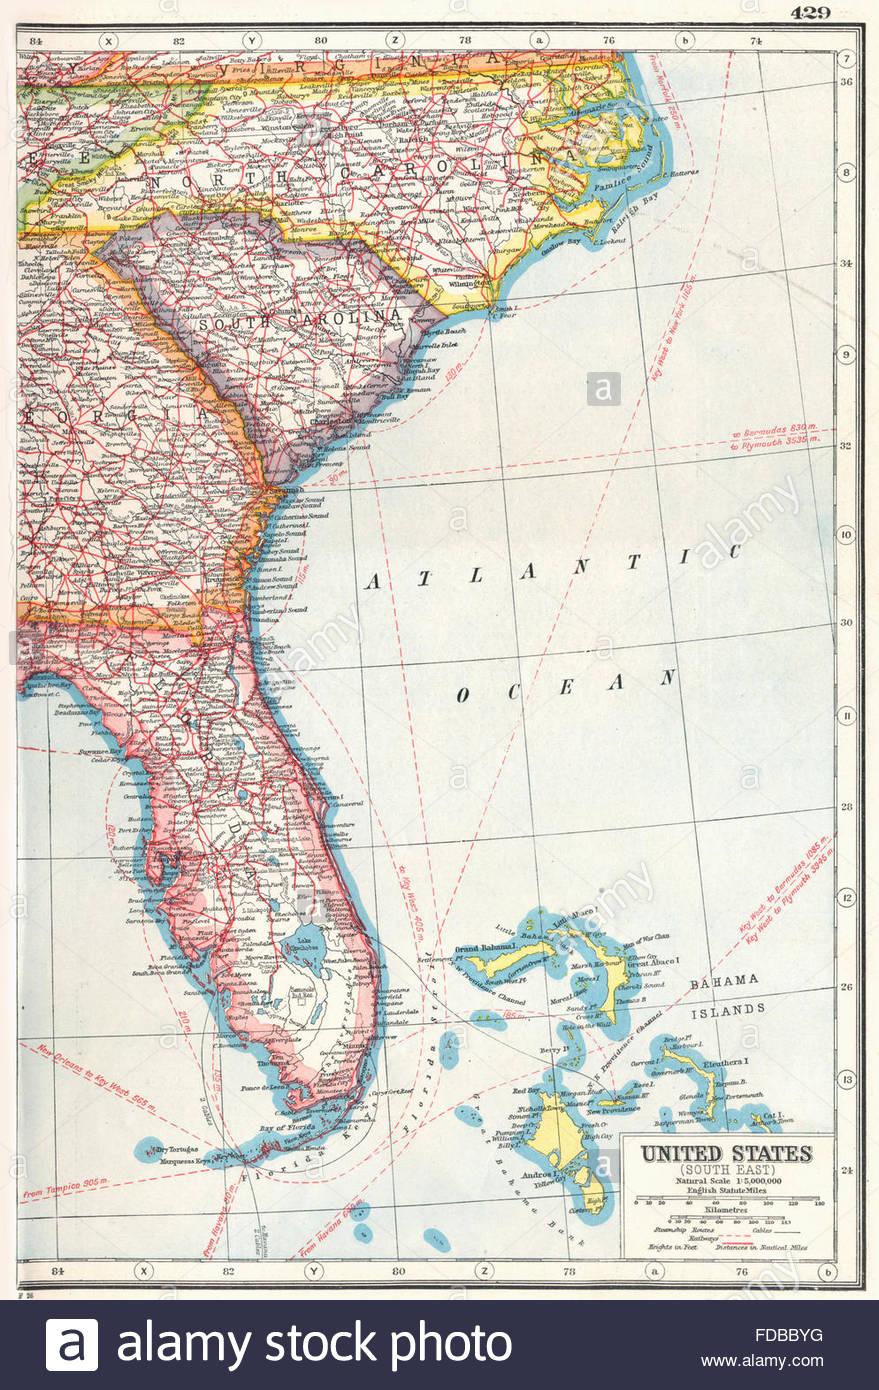 Usa: South East: Florida North Carolina South Carolina Georgia, 1920 - Florida North Map